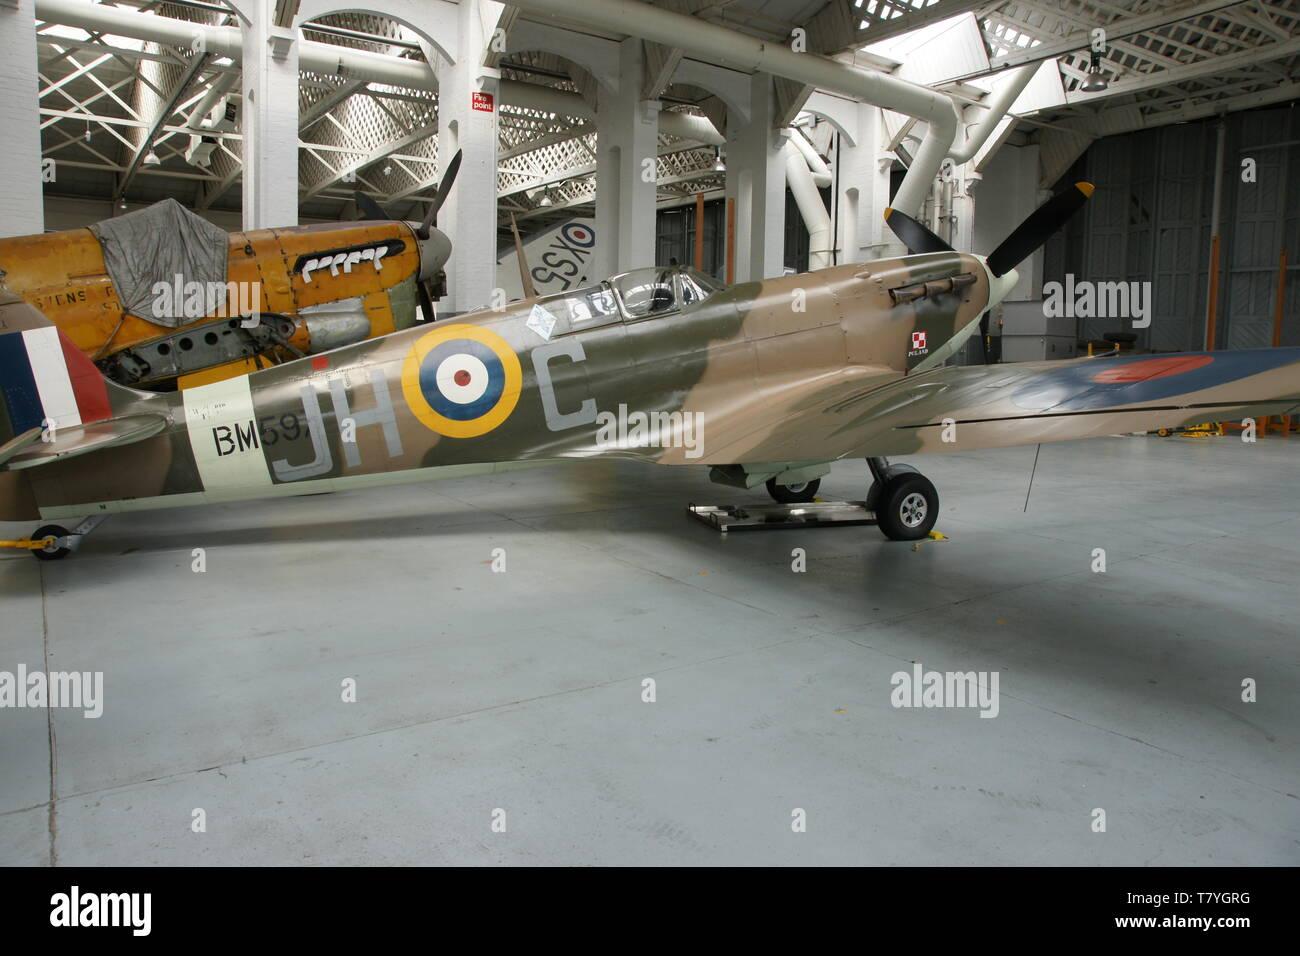 Supermarine Spitfire on Battle of Britain airfield, RAF Duxford - Stock Image